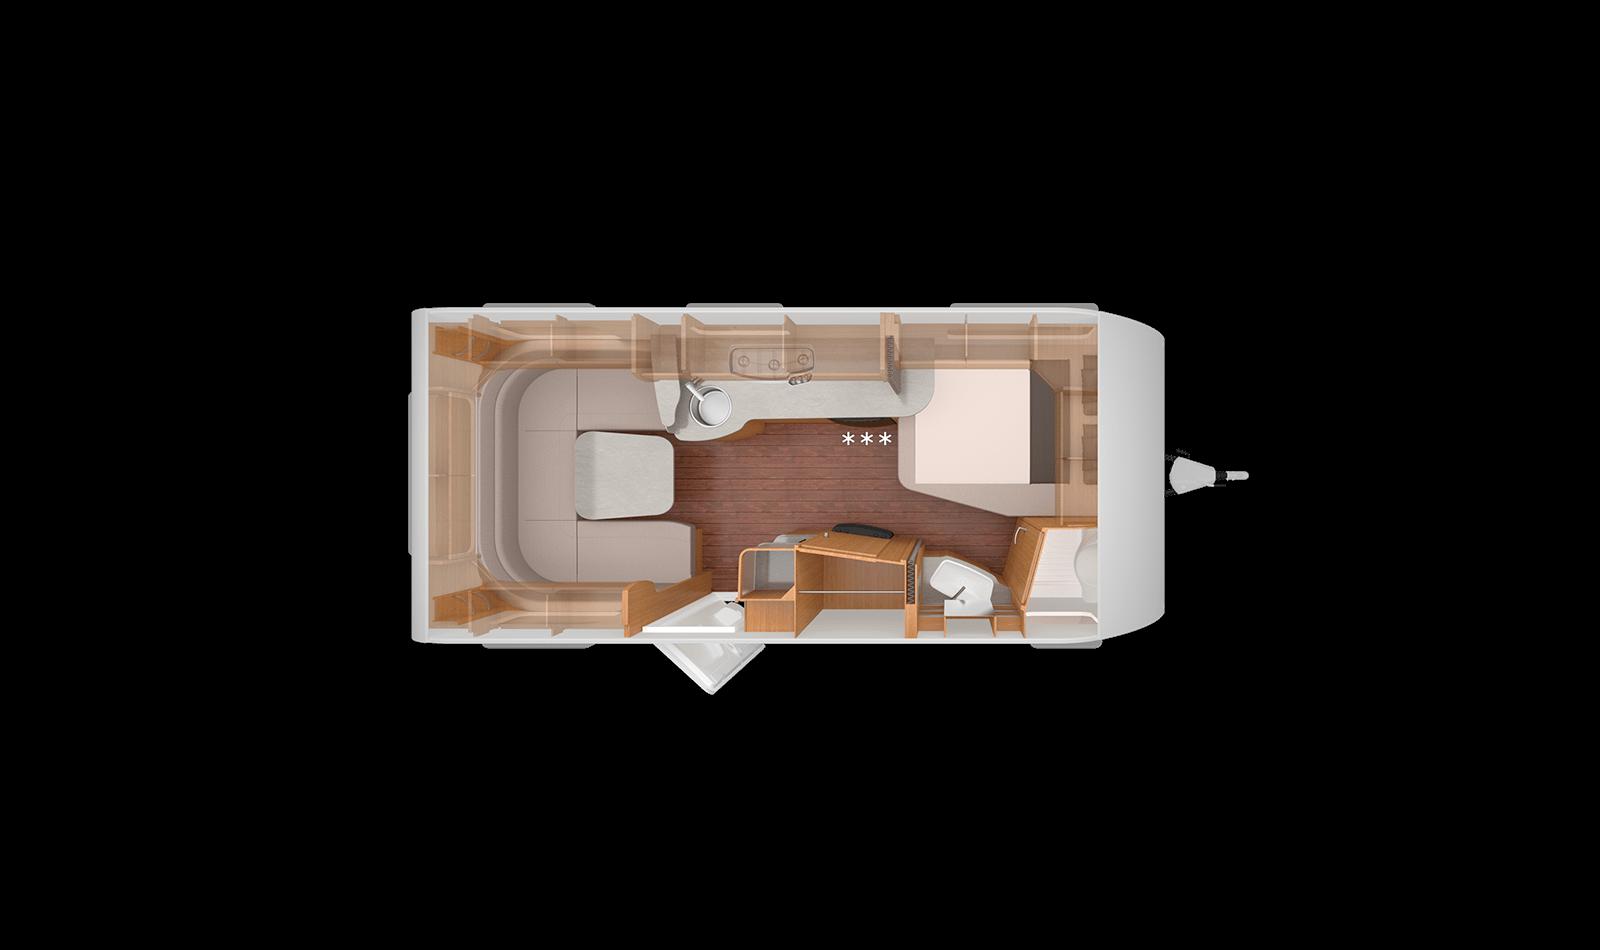 KNAUS SÜDWIND SILVER SELECTION | Das Caravan Sondermodell